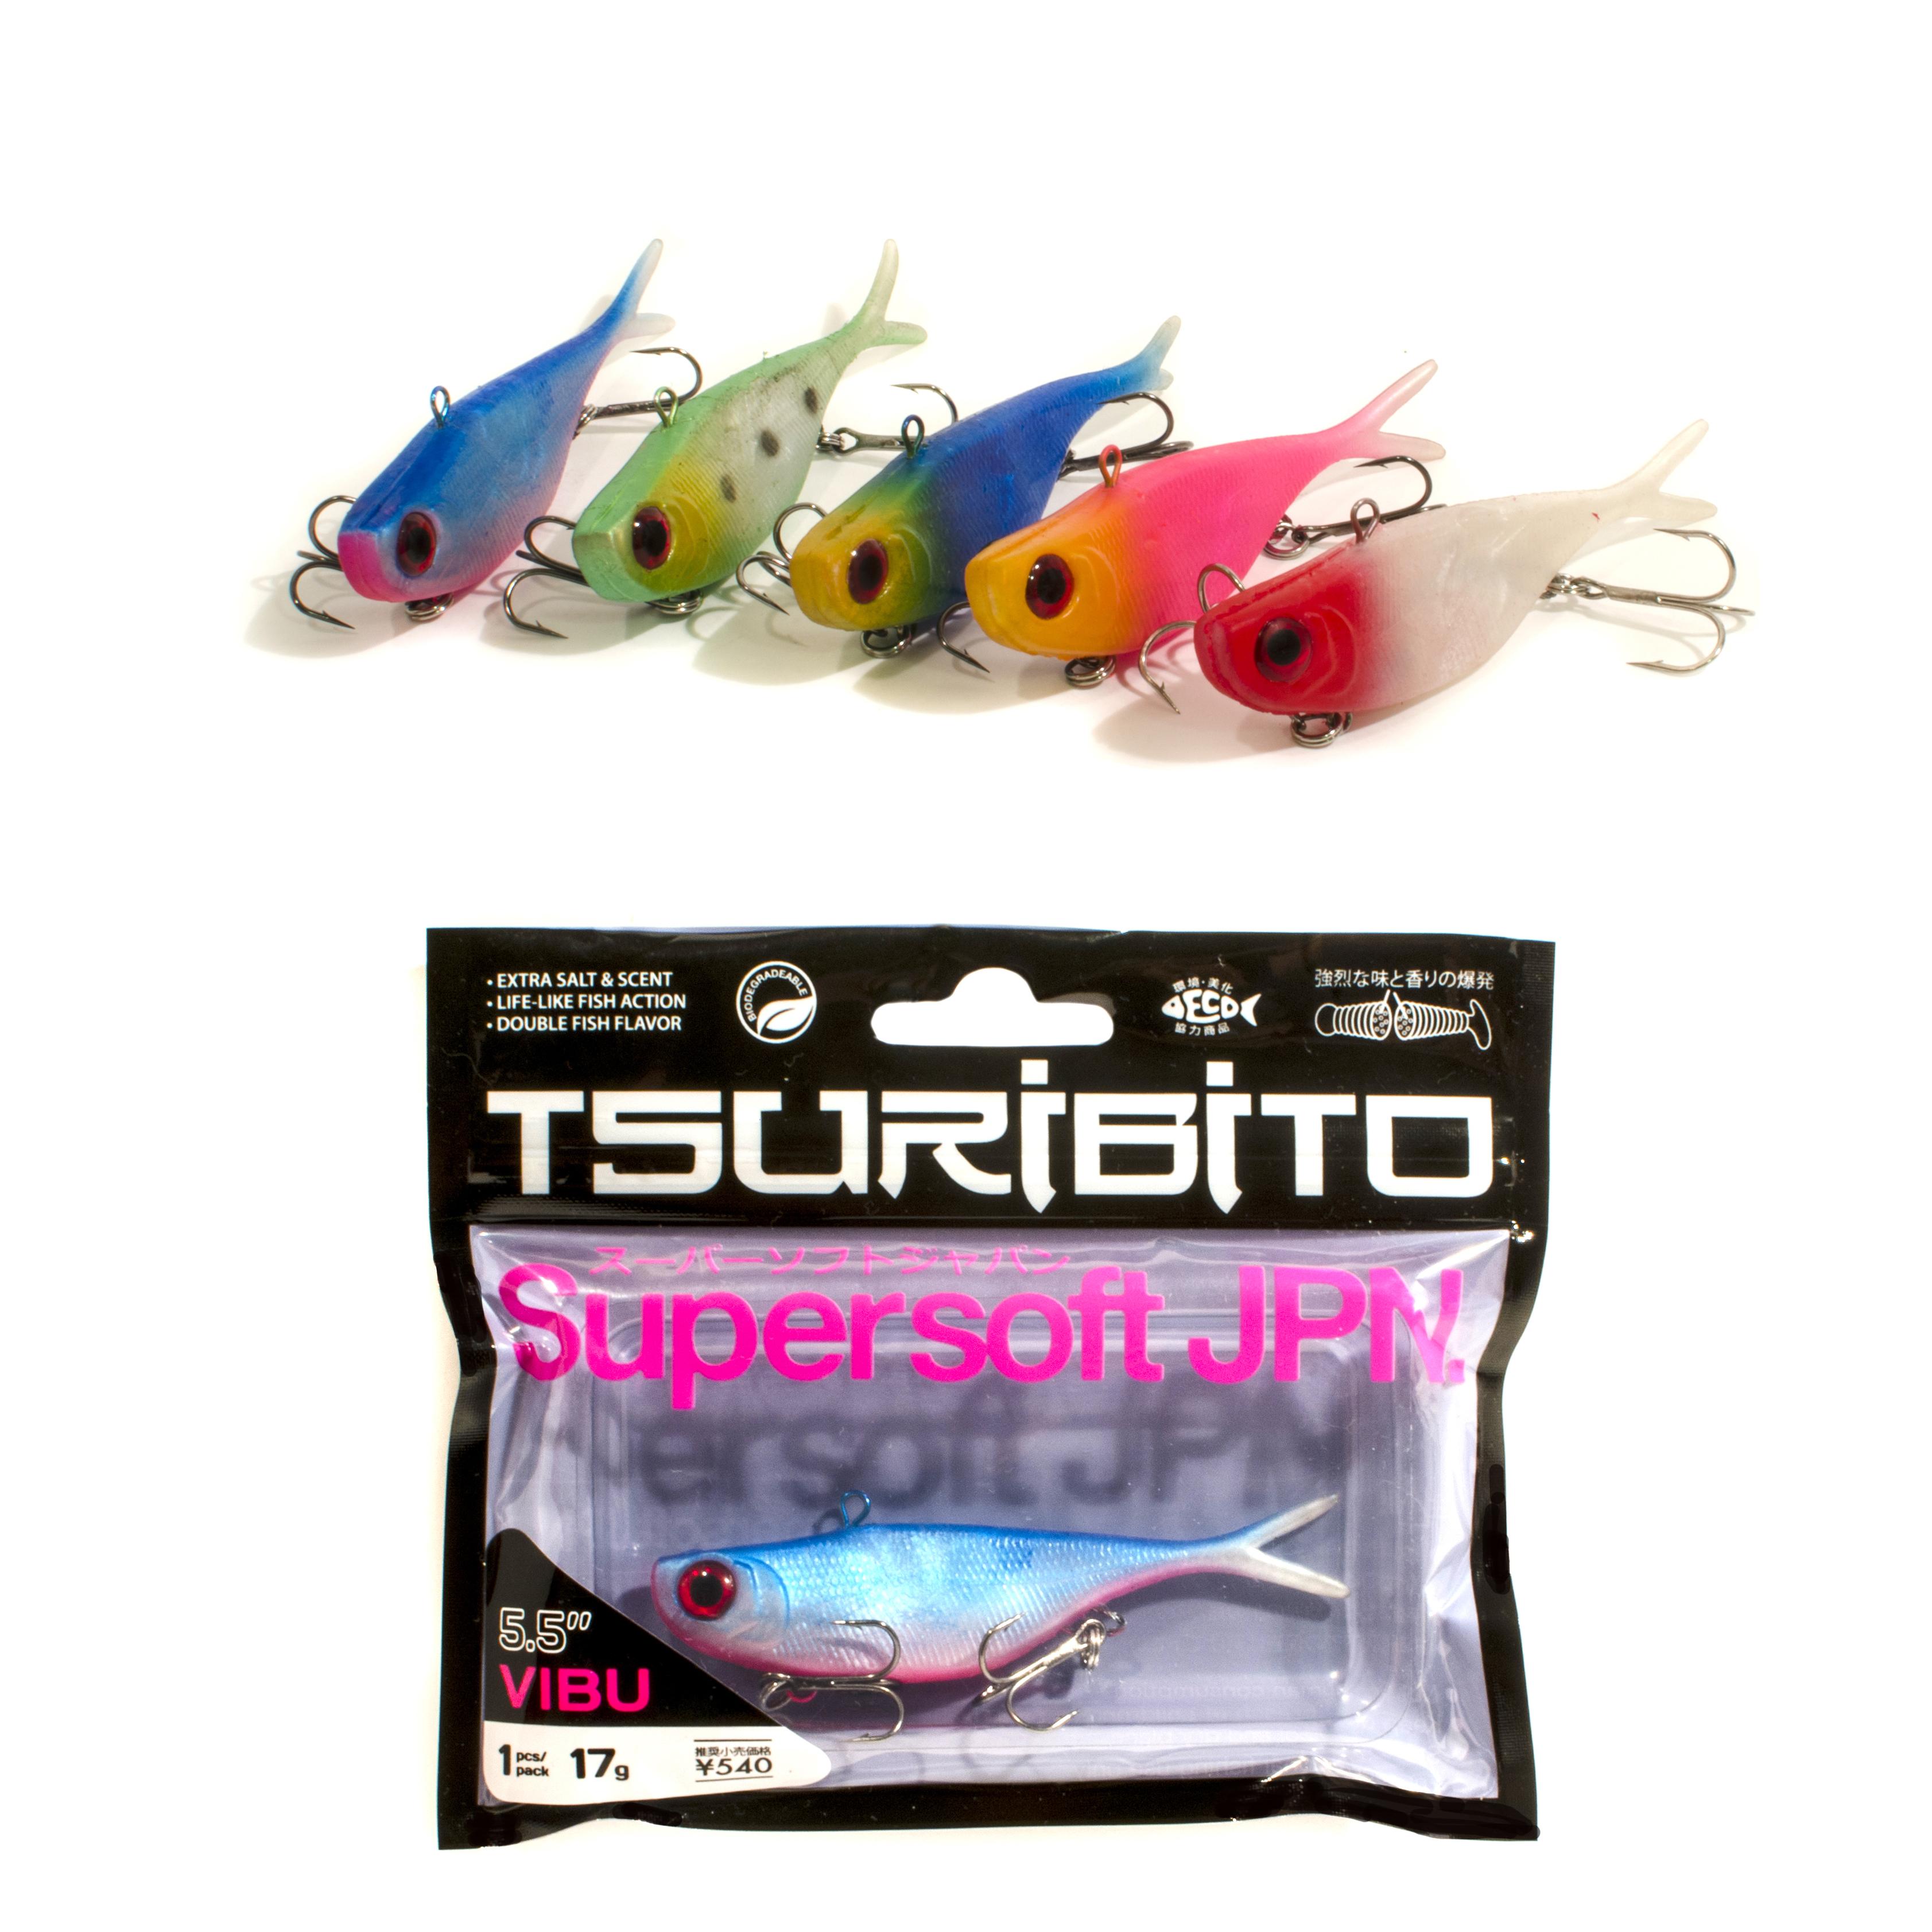 Приманка Tsuribito Supersoft Vibu 3.5Мягкие приманки<br>Новая линейка мягких приманок от бренда Tsuribito<br>